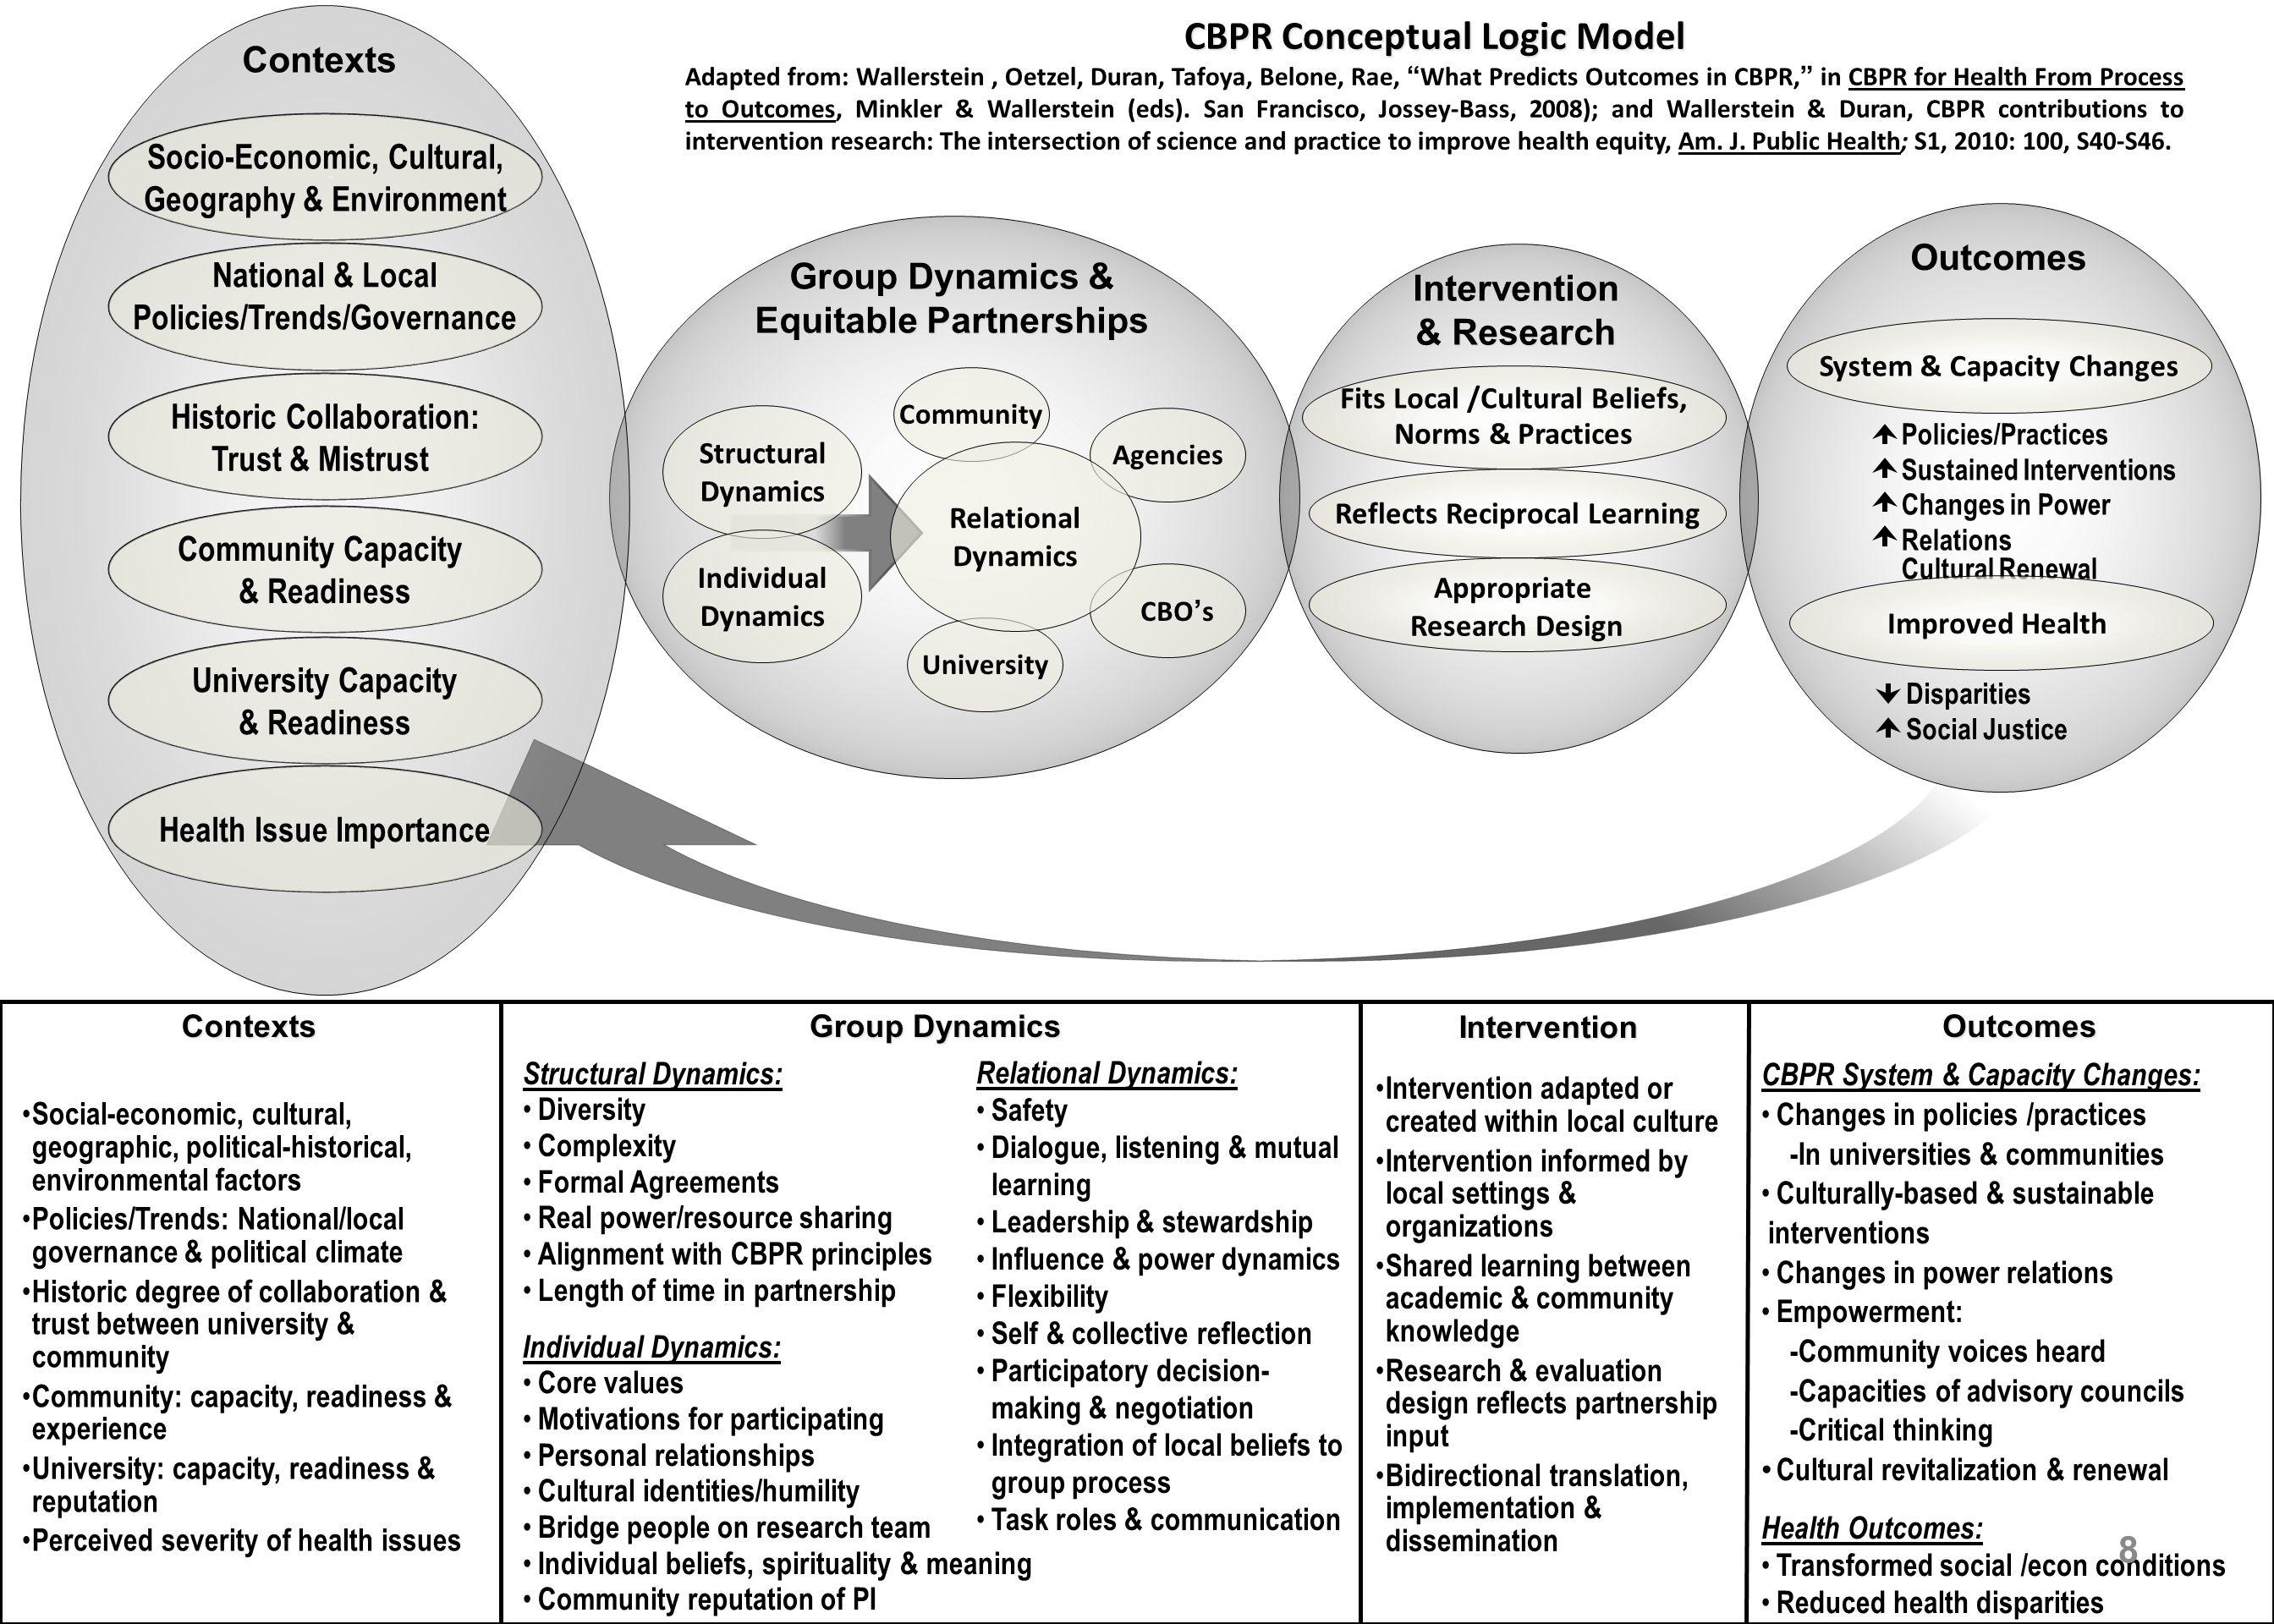 CBPR Conceptual Logic Model